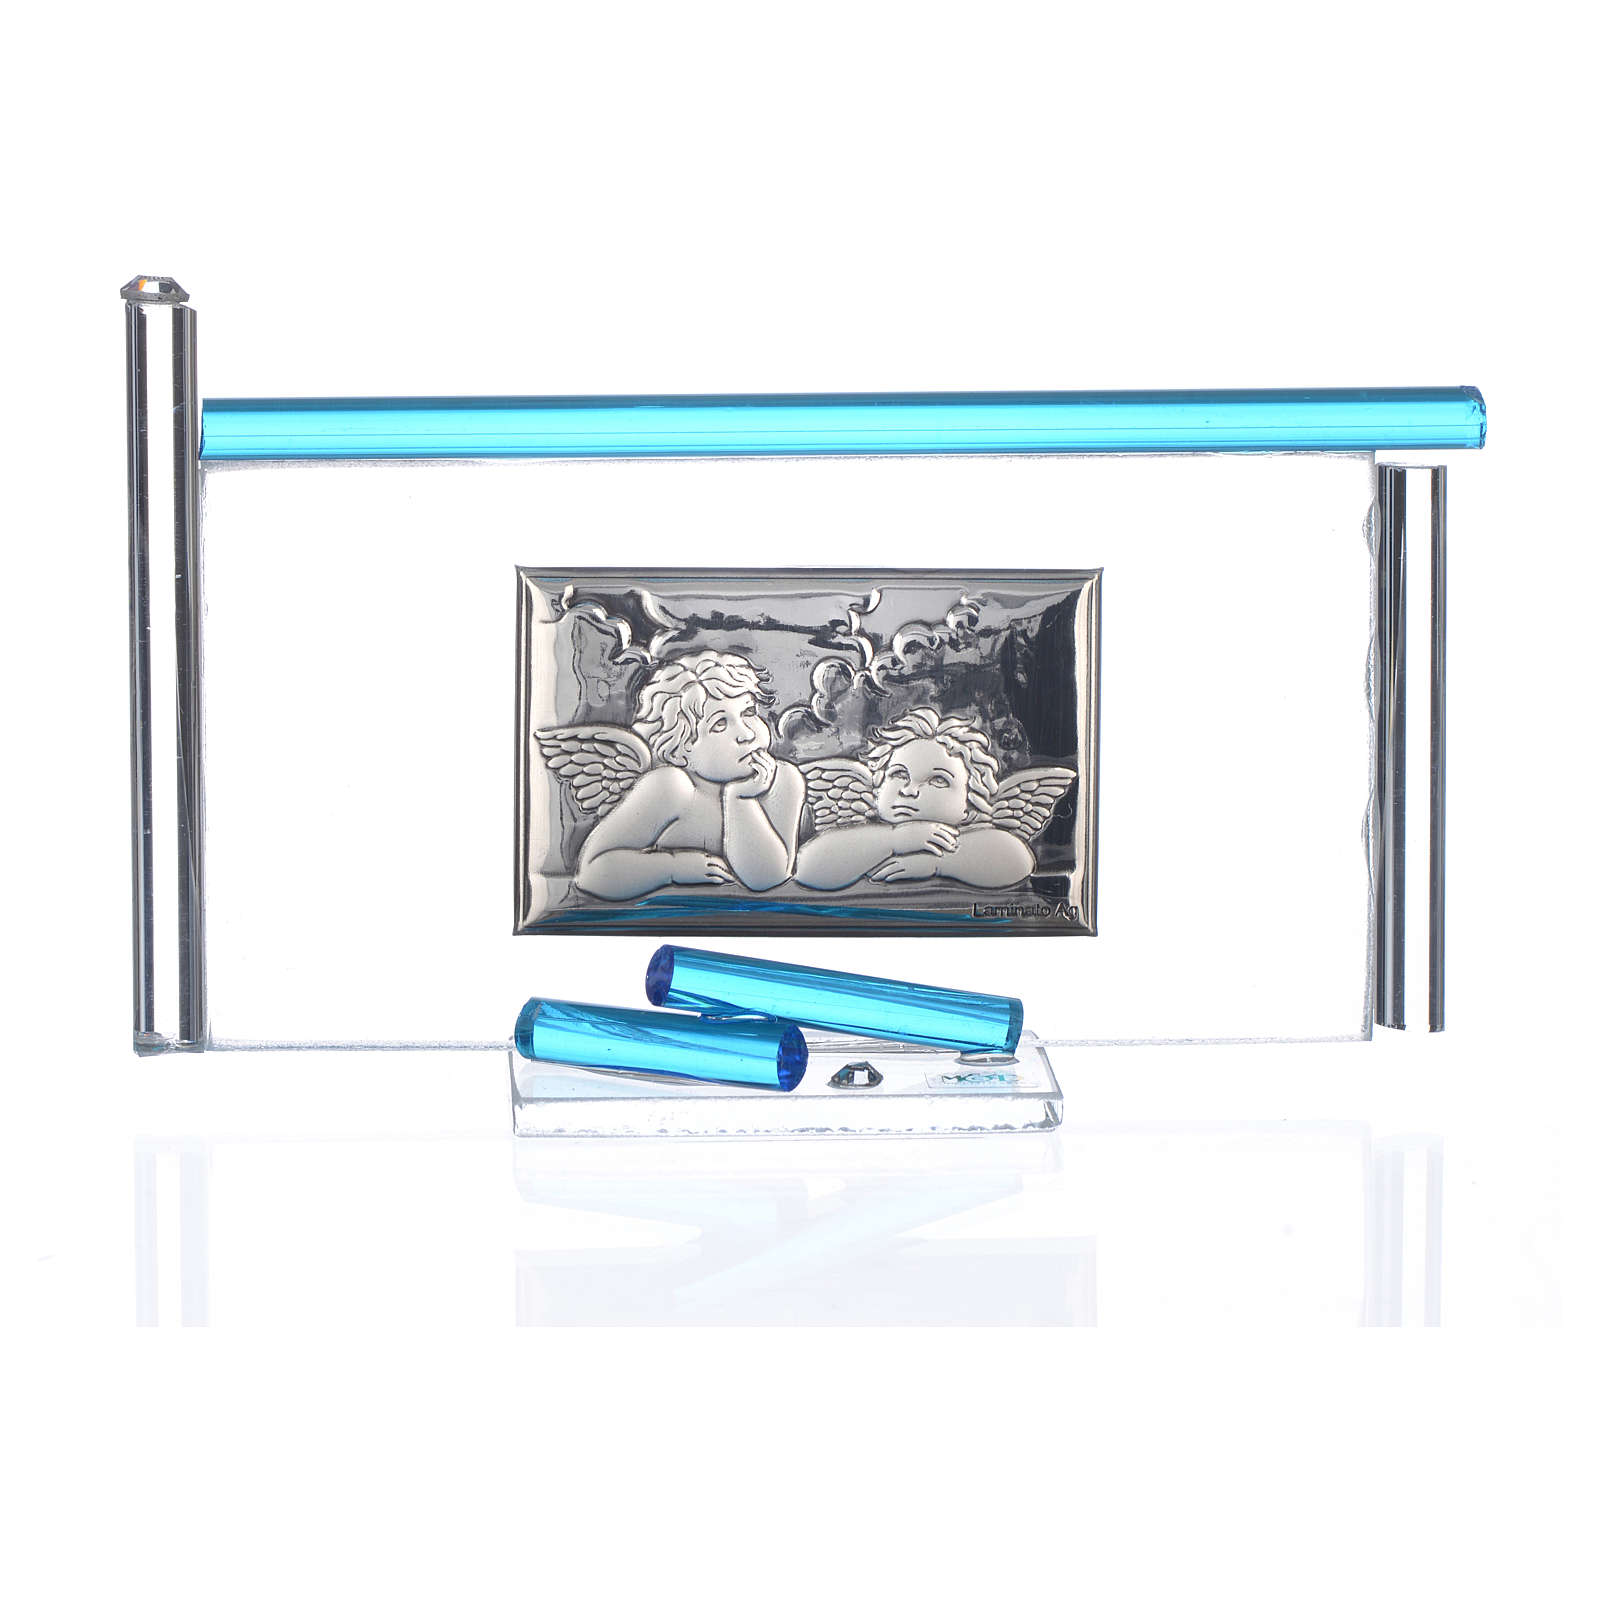 Icona Angeli argento e vetro Murano Acquamarina 13x8 cm 3